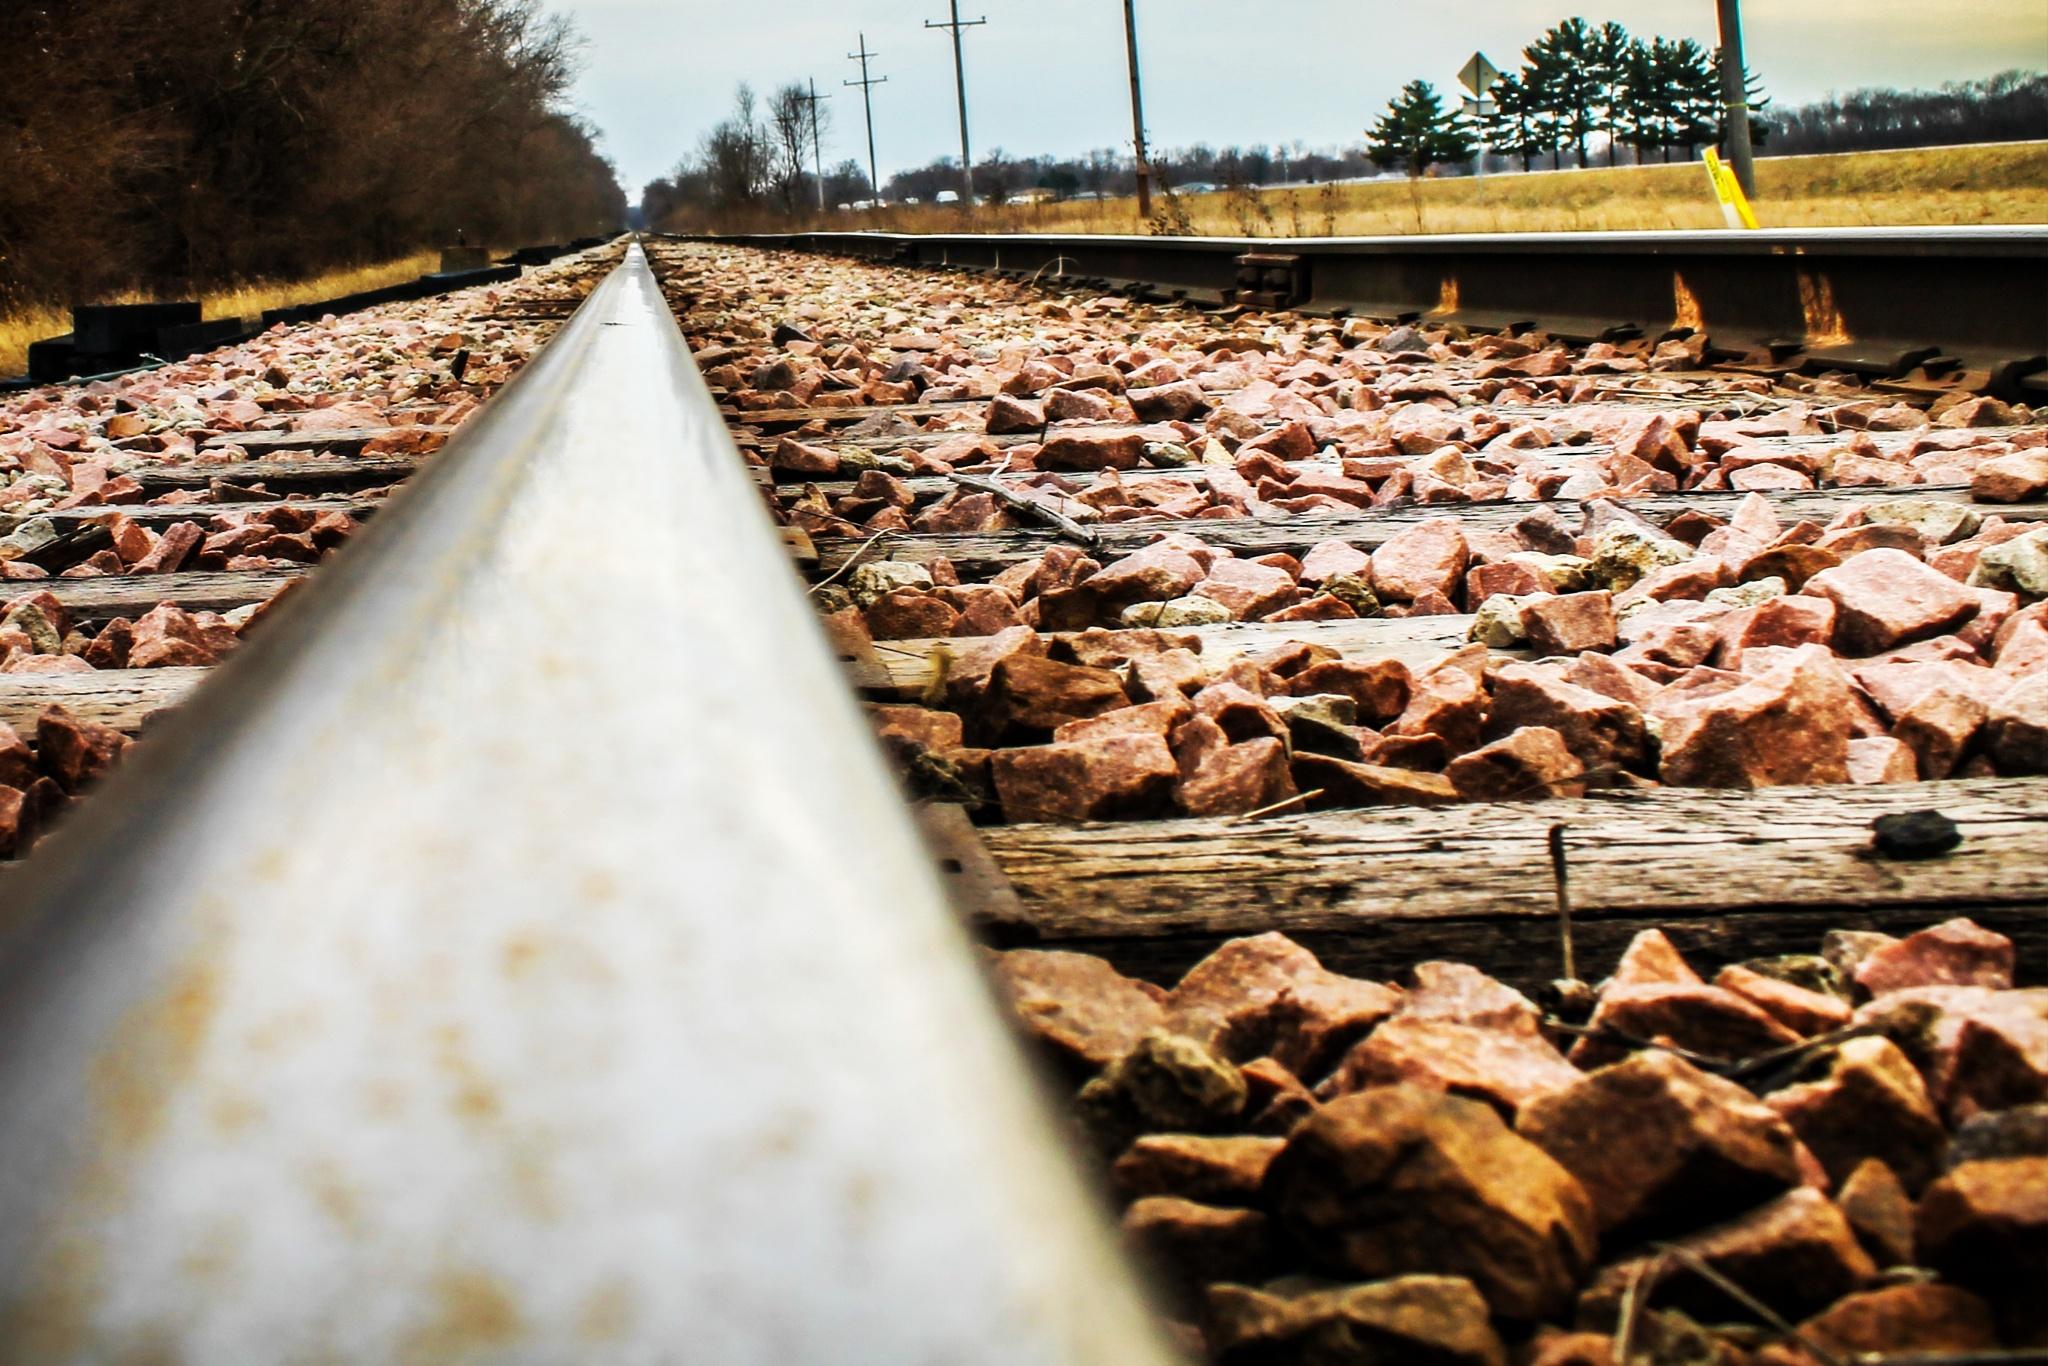 Ridin' the Rail by Mark Hootman